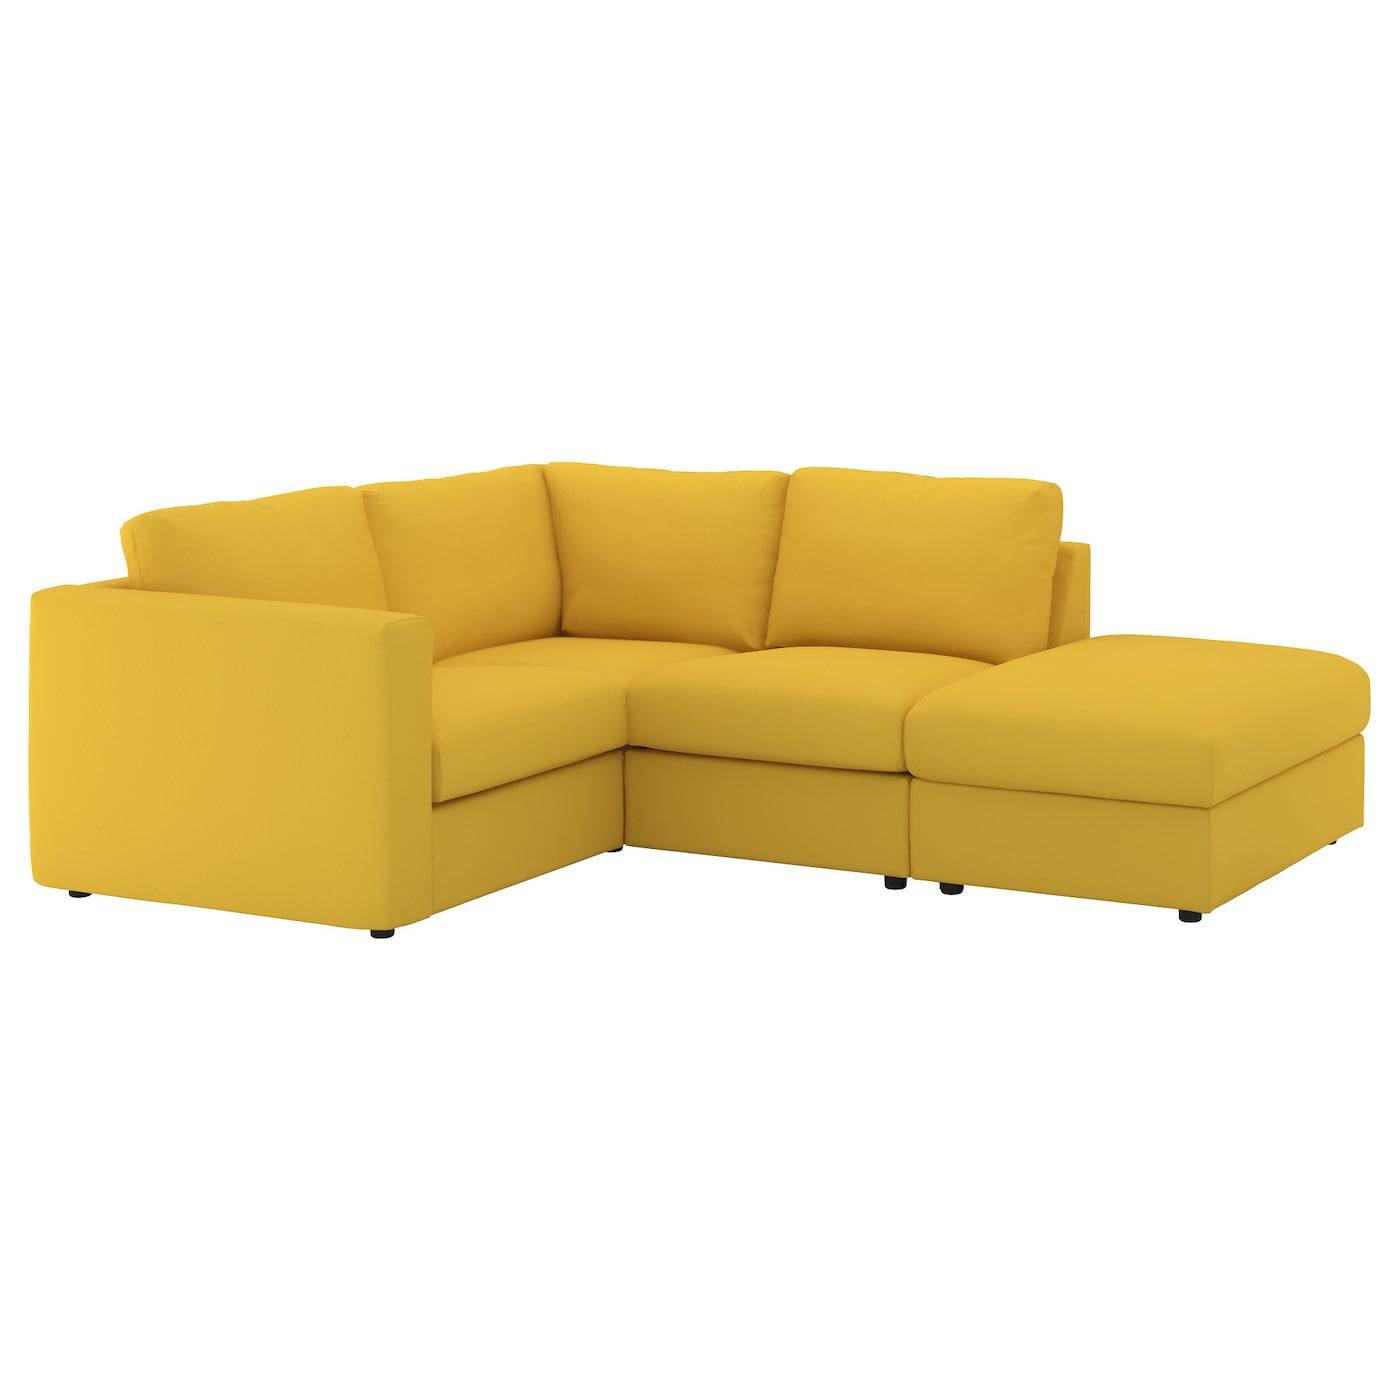 Ikea 3 Seater Sofa Rp Sectional 3 Seat Lofallet Beige Ikea Thesofa